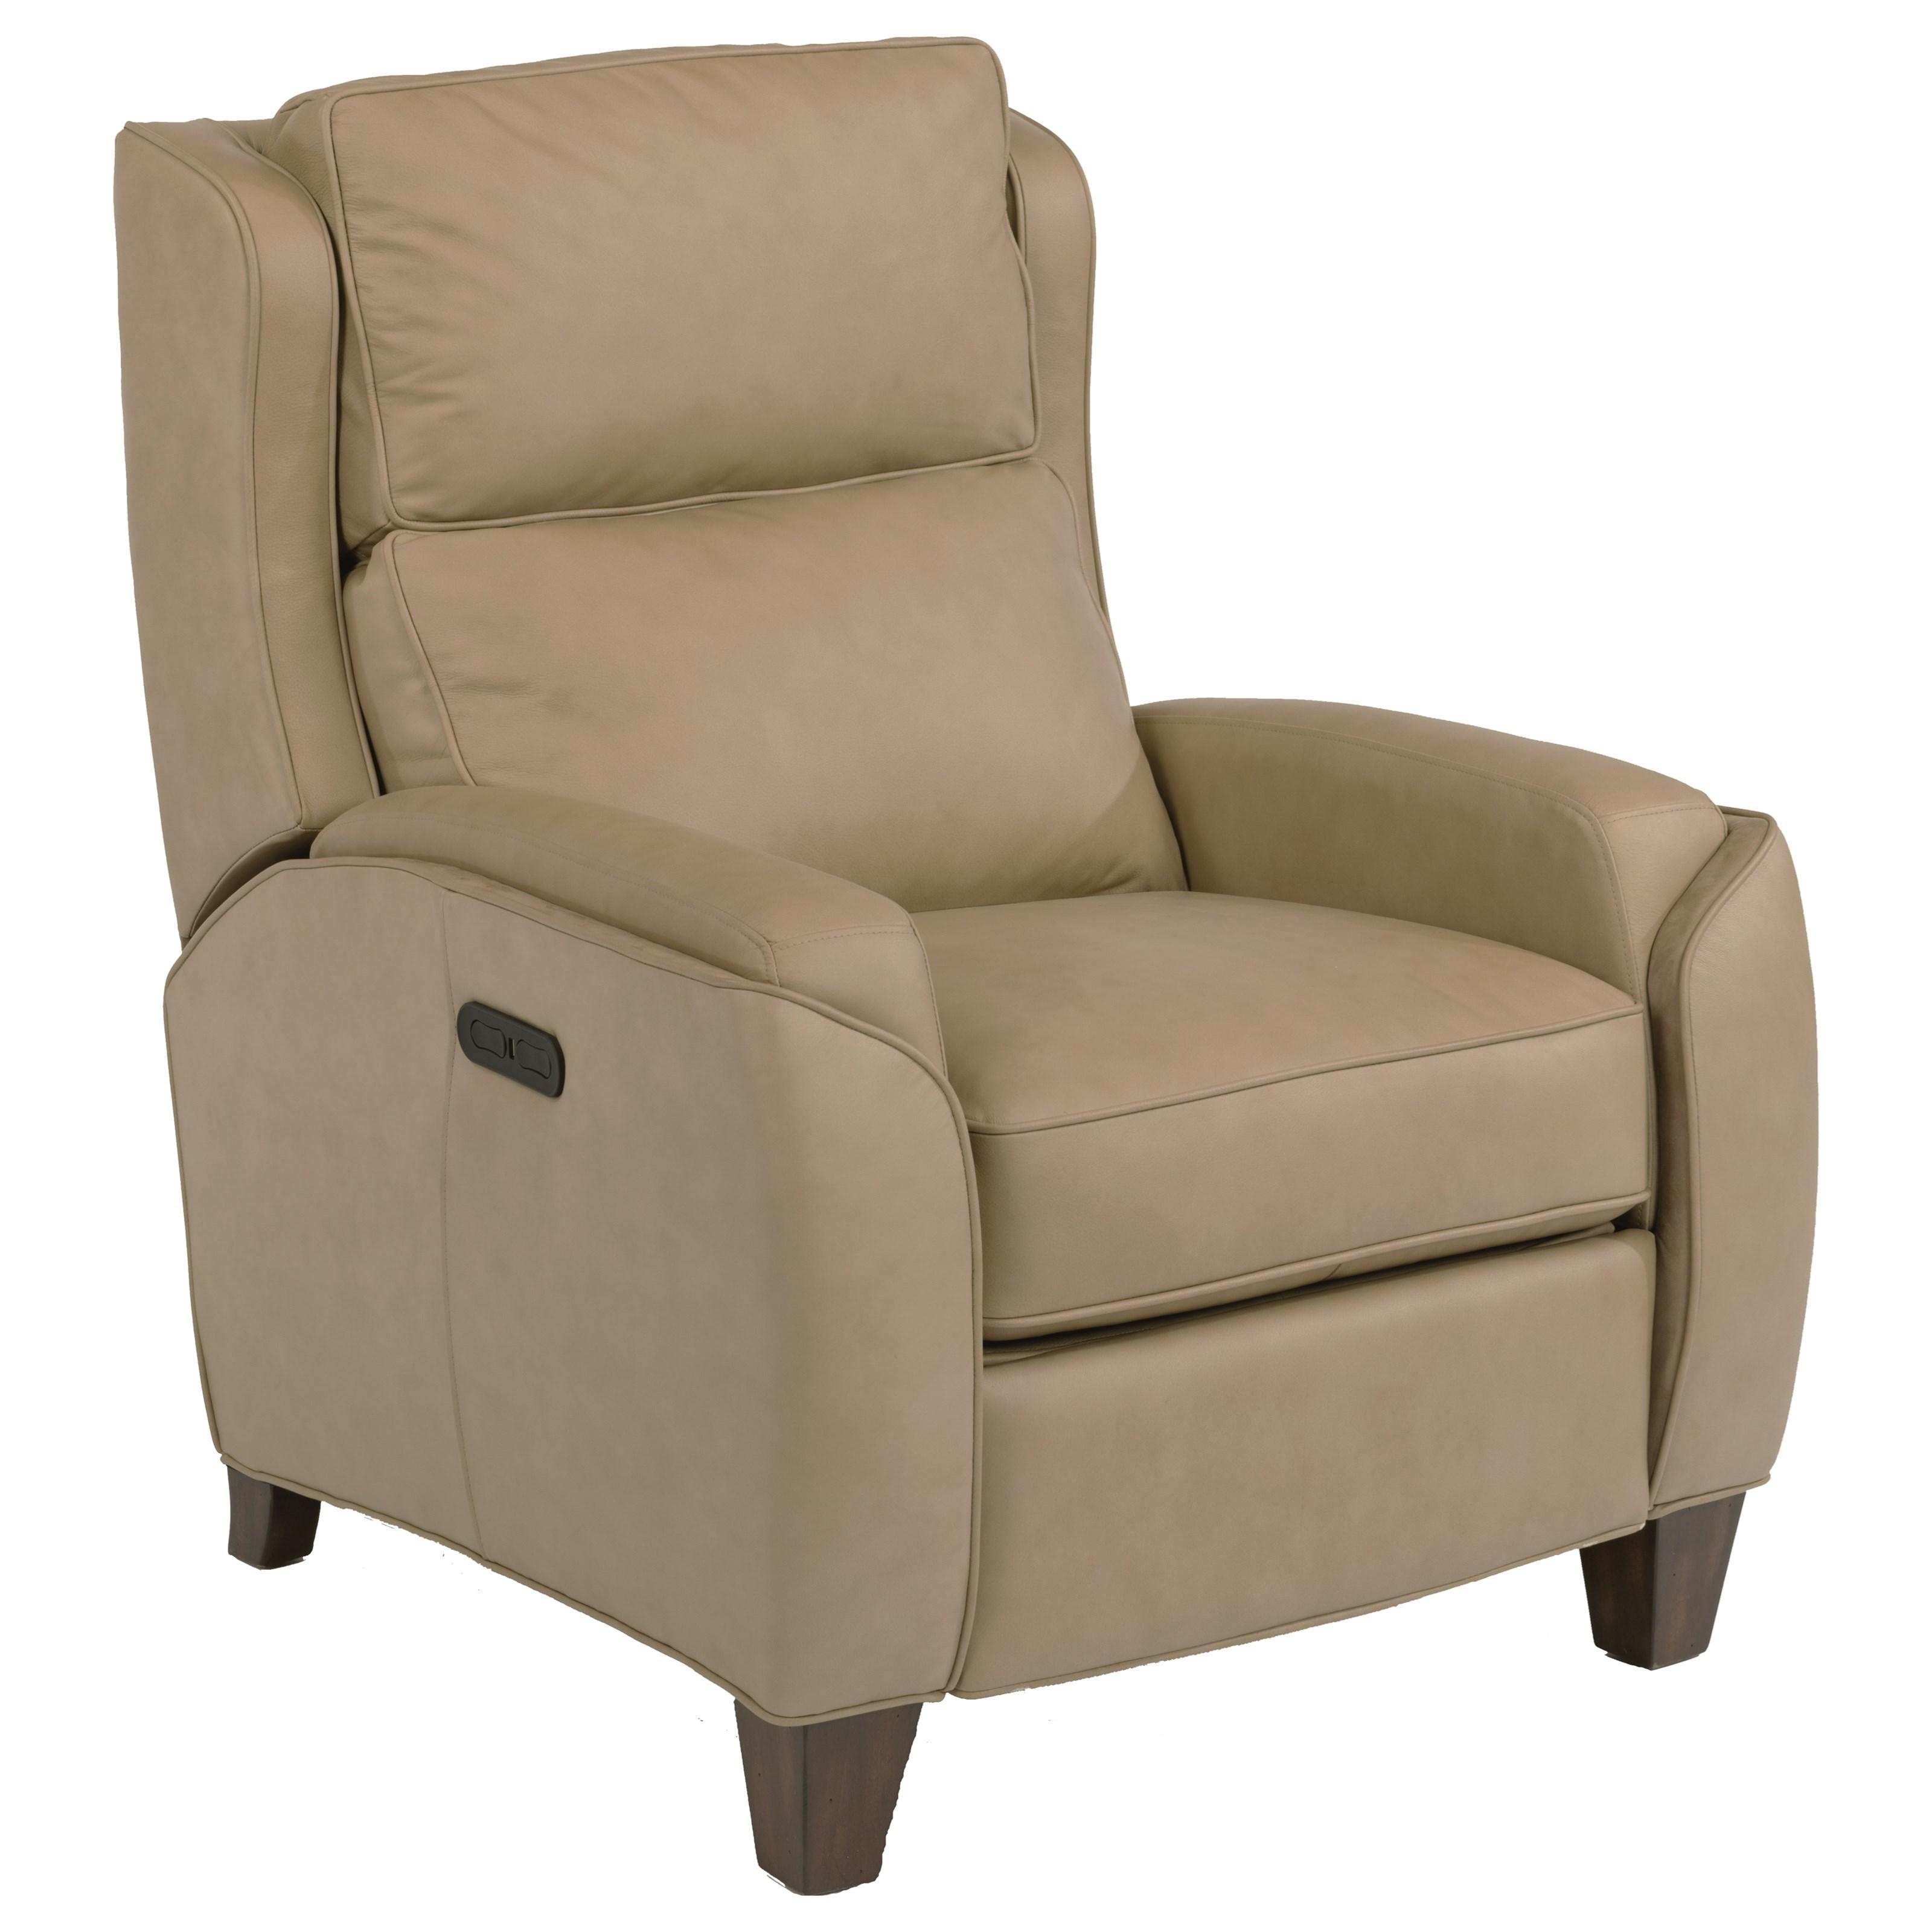 swivel chair price philippines green bean bag flexsteel latitudes rose 1769 50ph power recliner w pwr